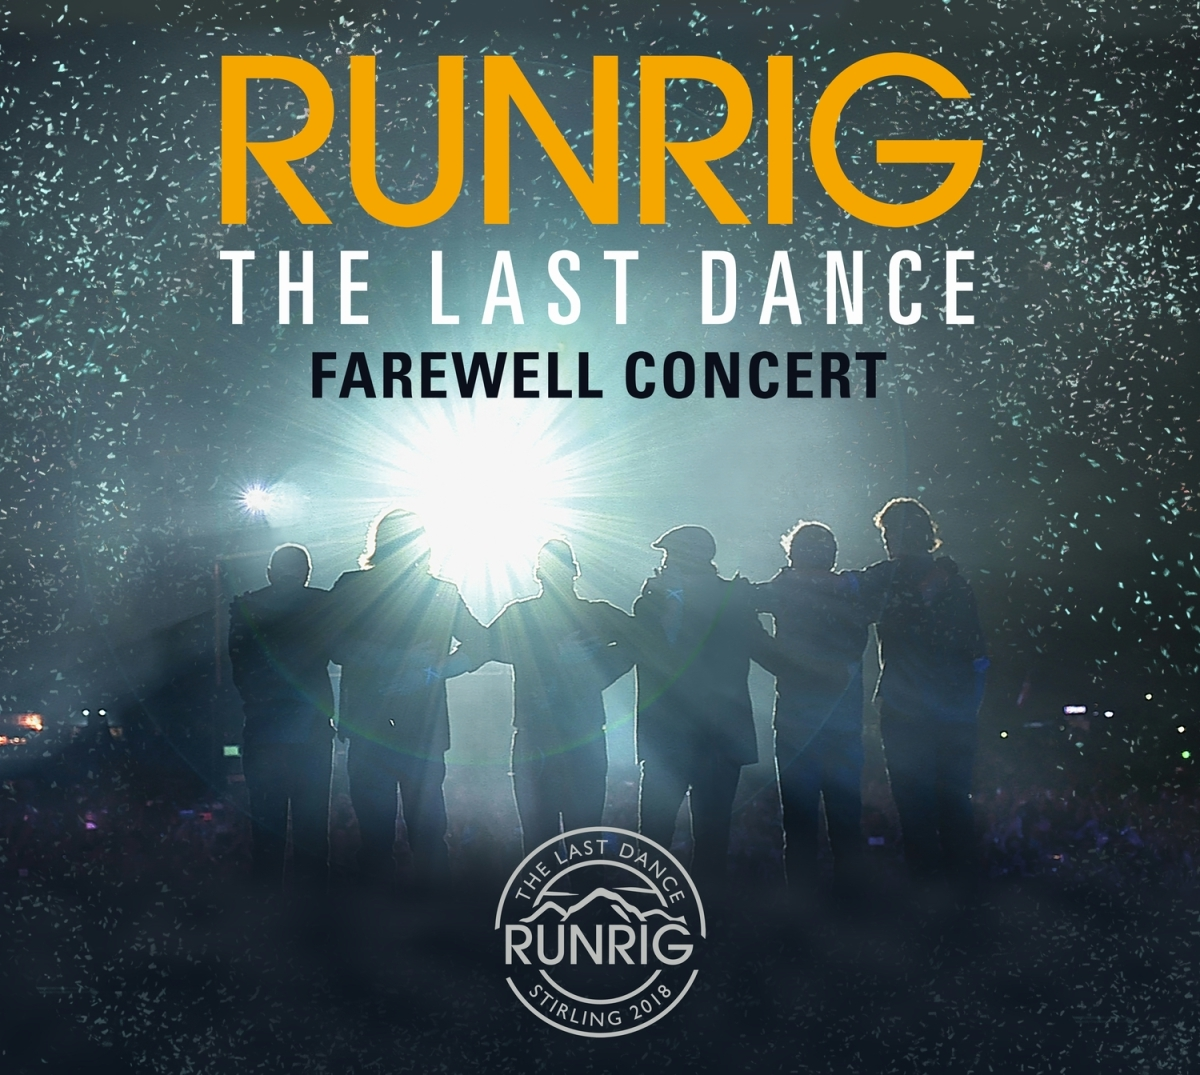 The Last Dance - Farewell Concert - Runrig - Musik - RCA - 0190759691625 - August 16, 2019